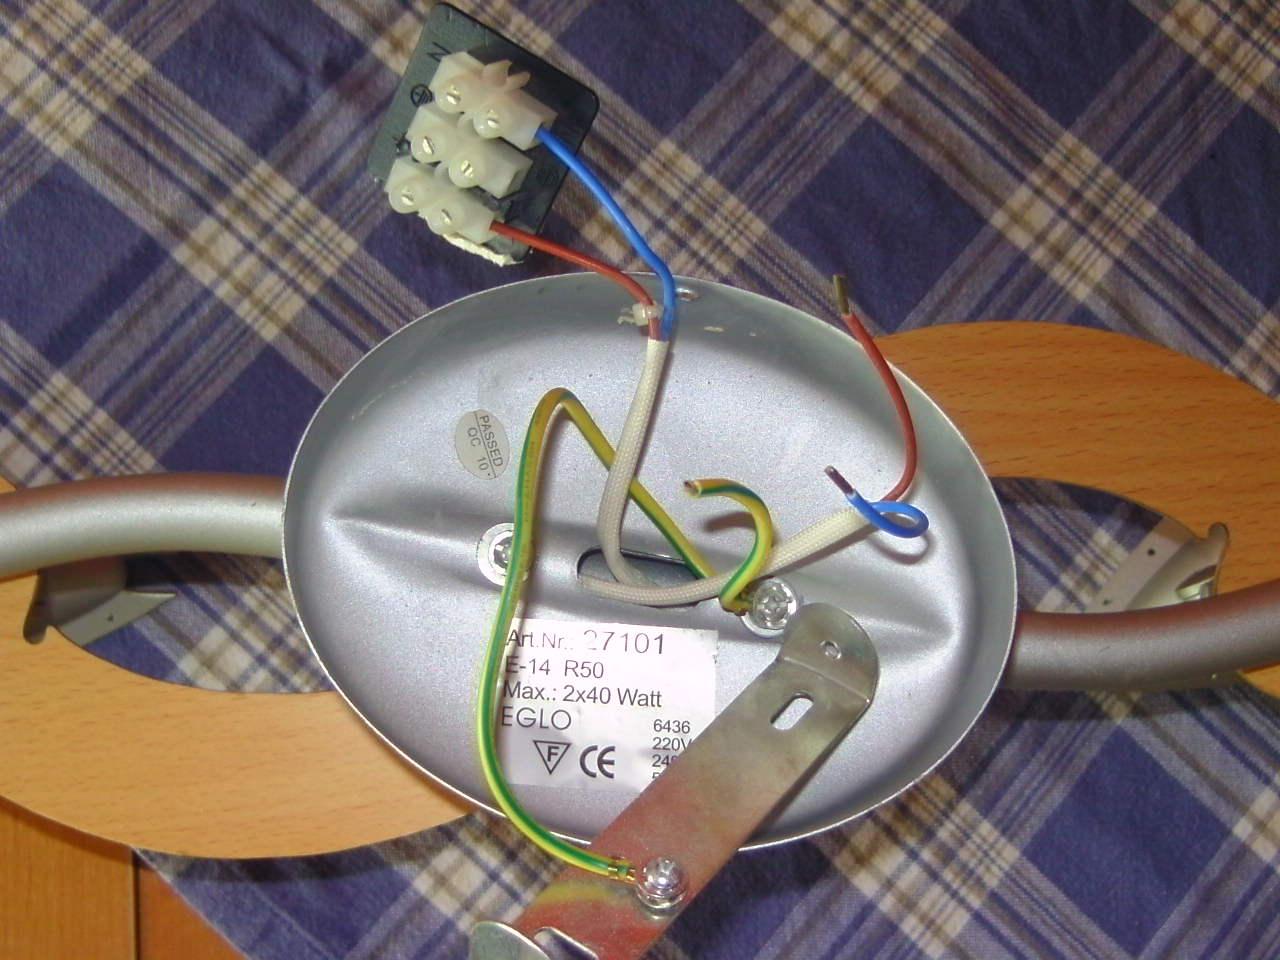 Lampe Anschließen Kabel Ohne Farben Lampe Anschließen So Gelingt